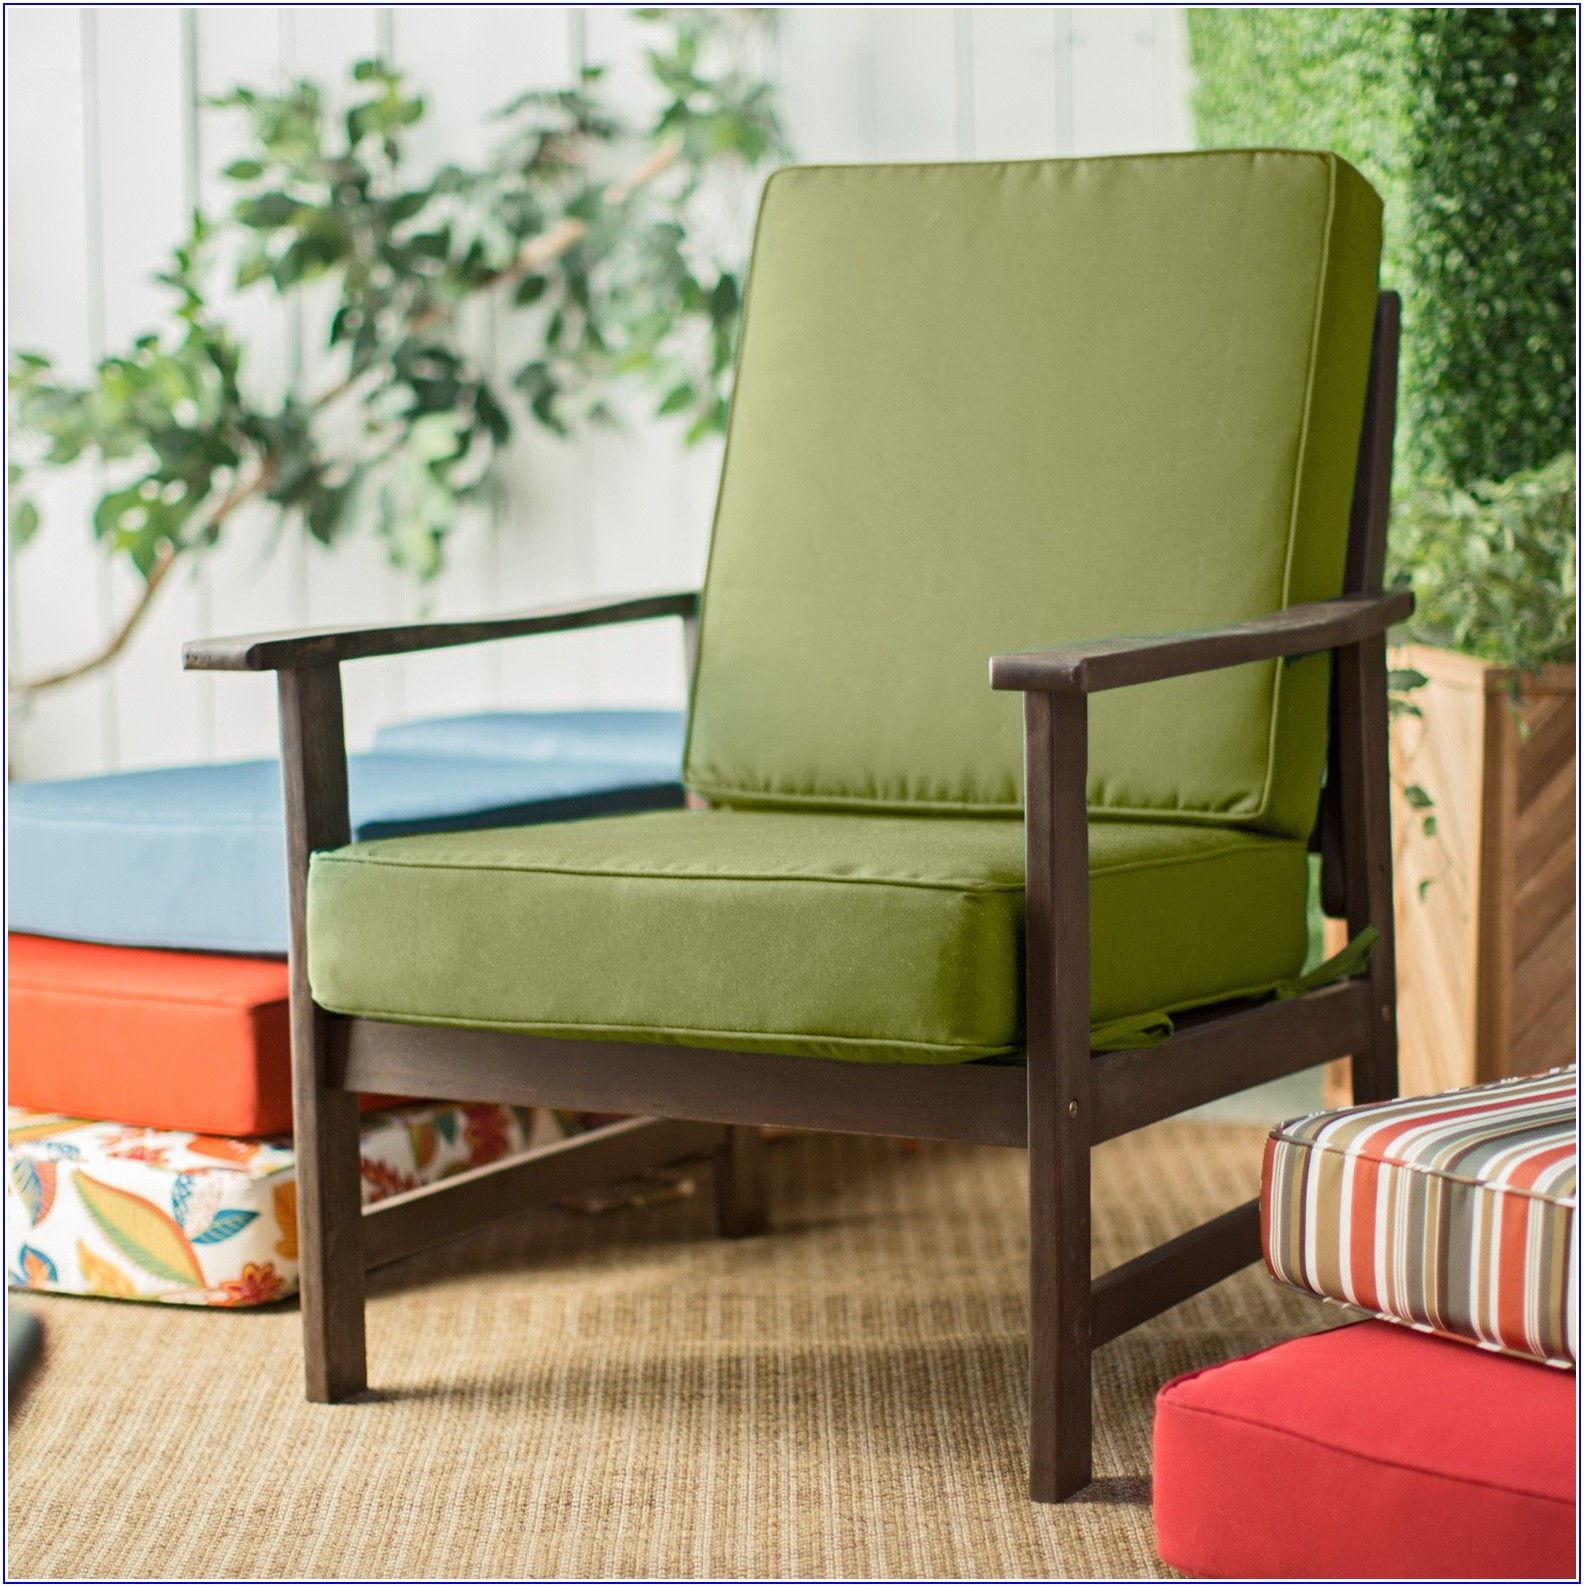 Patio Furniture Cushions 22x22